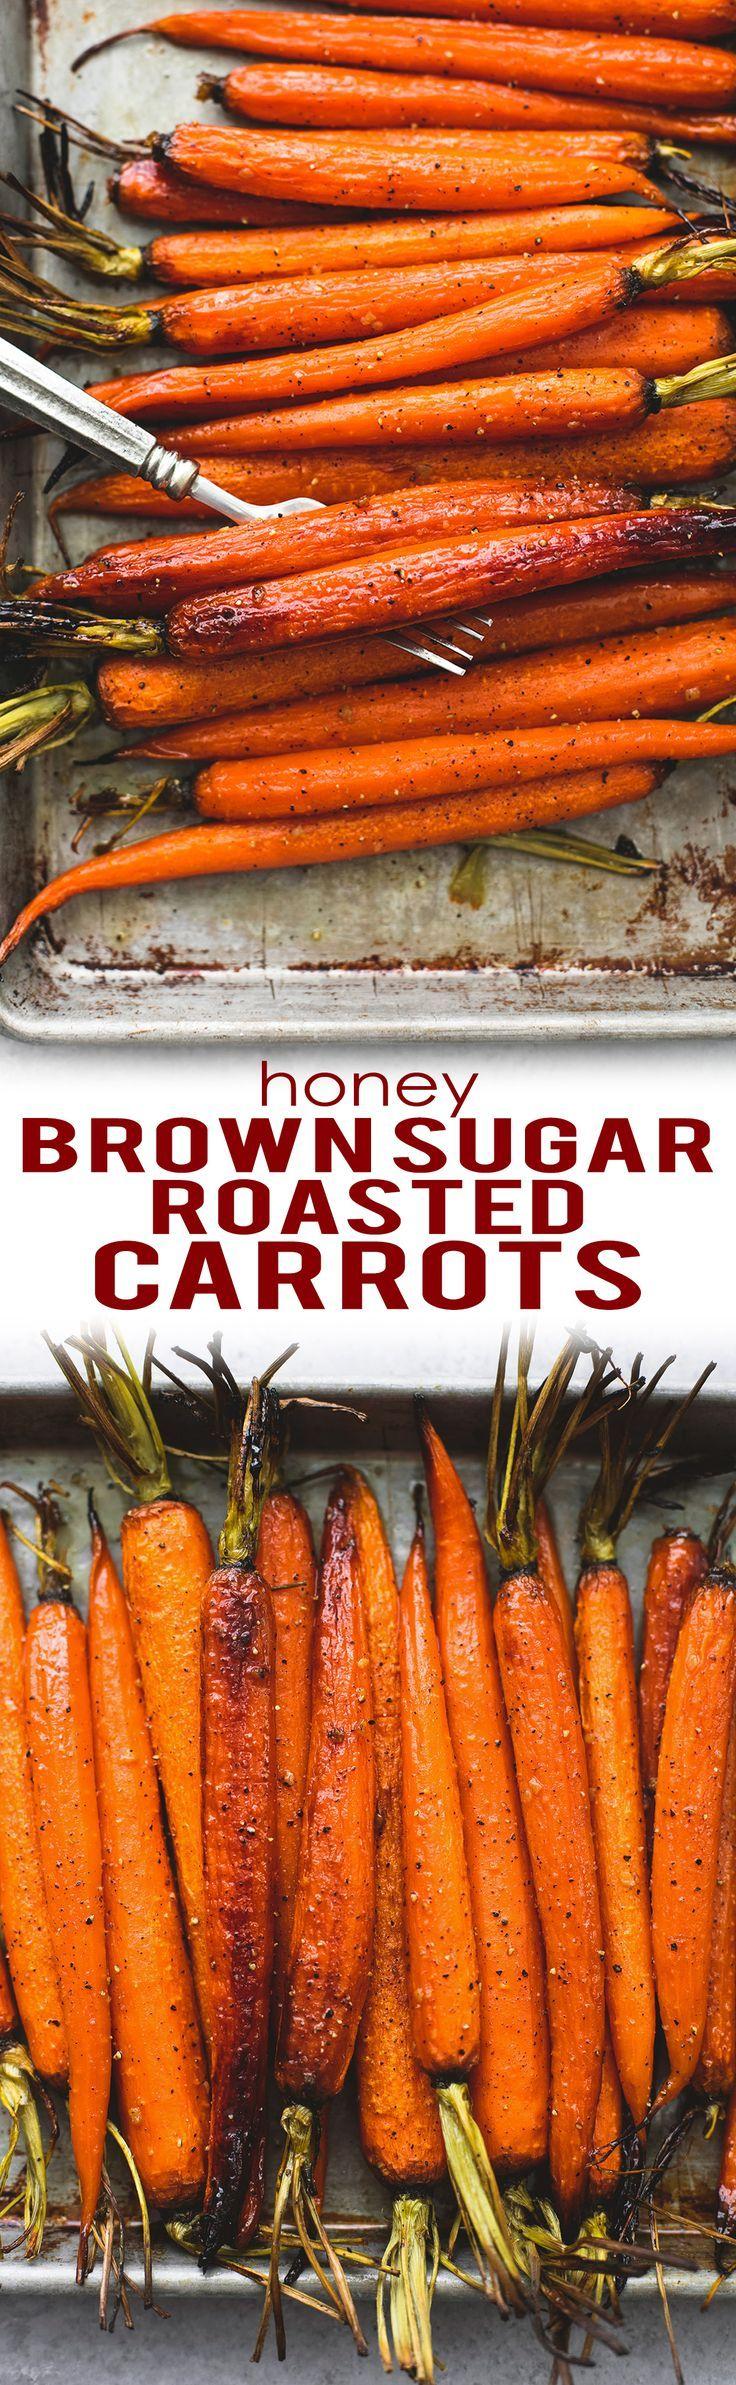 Honey Brown Sugar Roasted Carrots | http://lecremedelacrumb.com